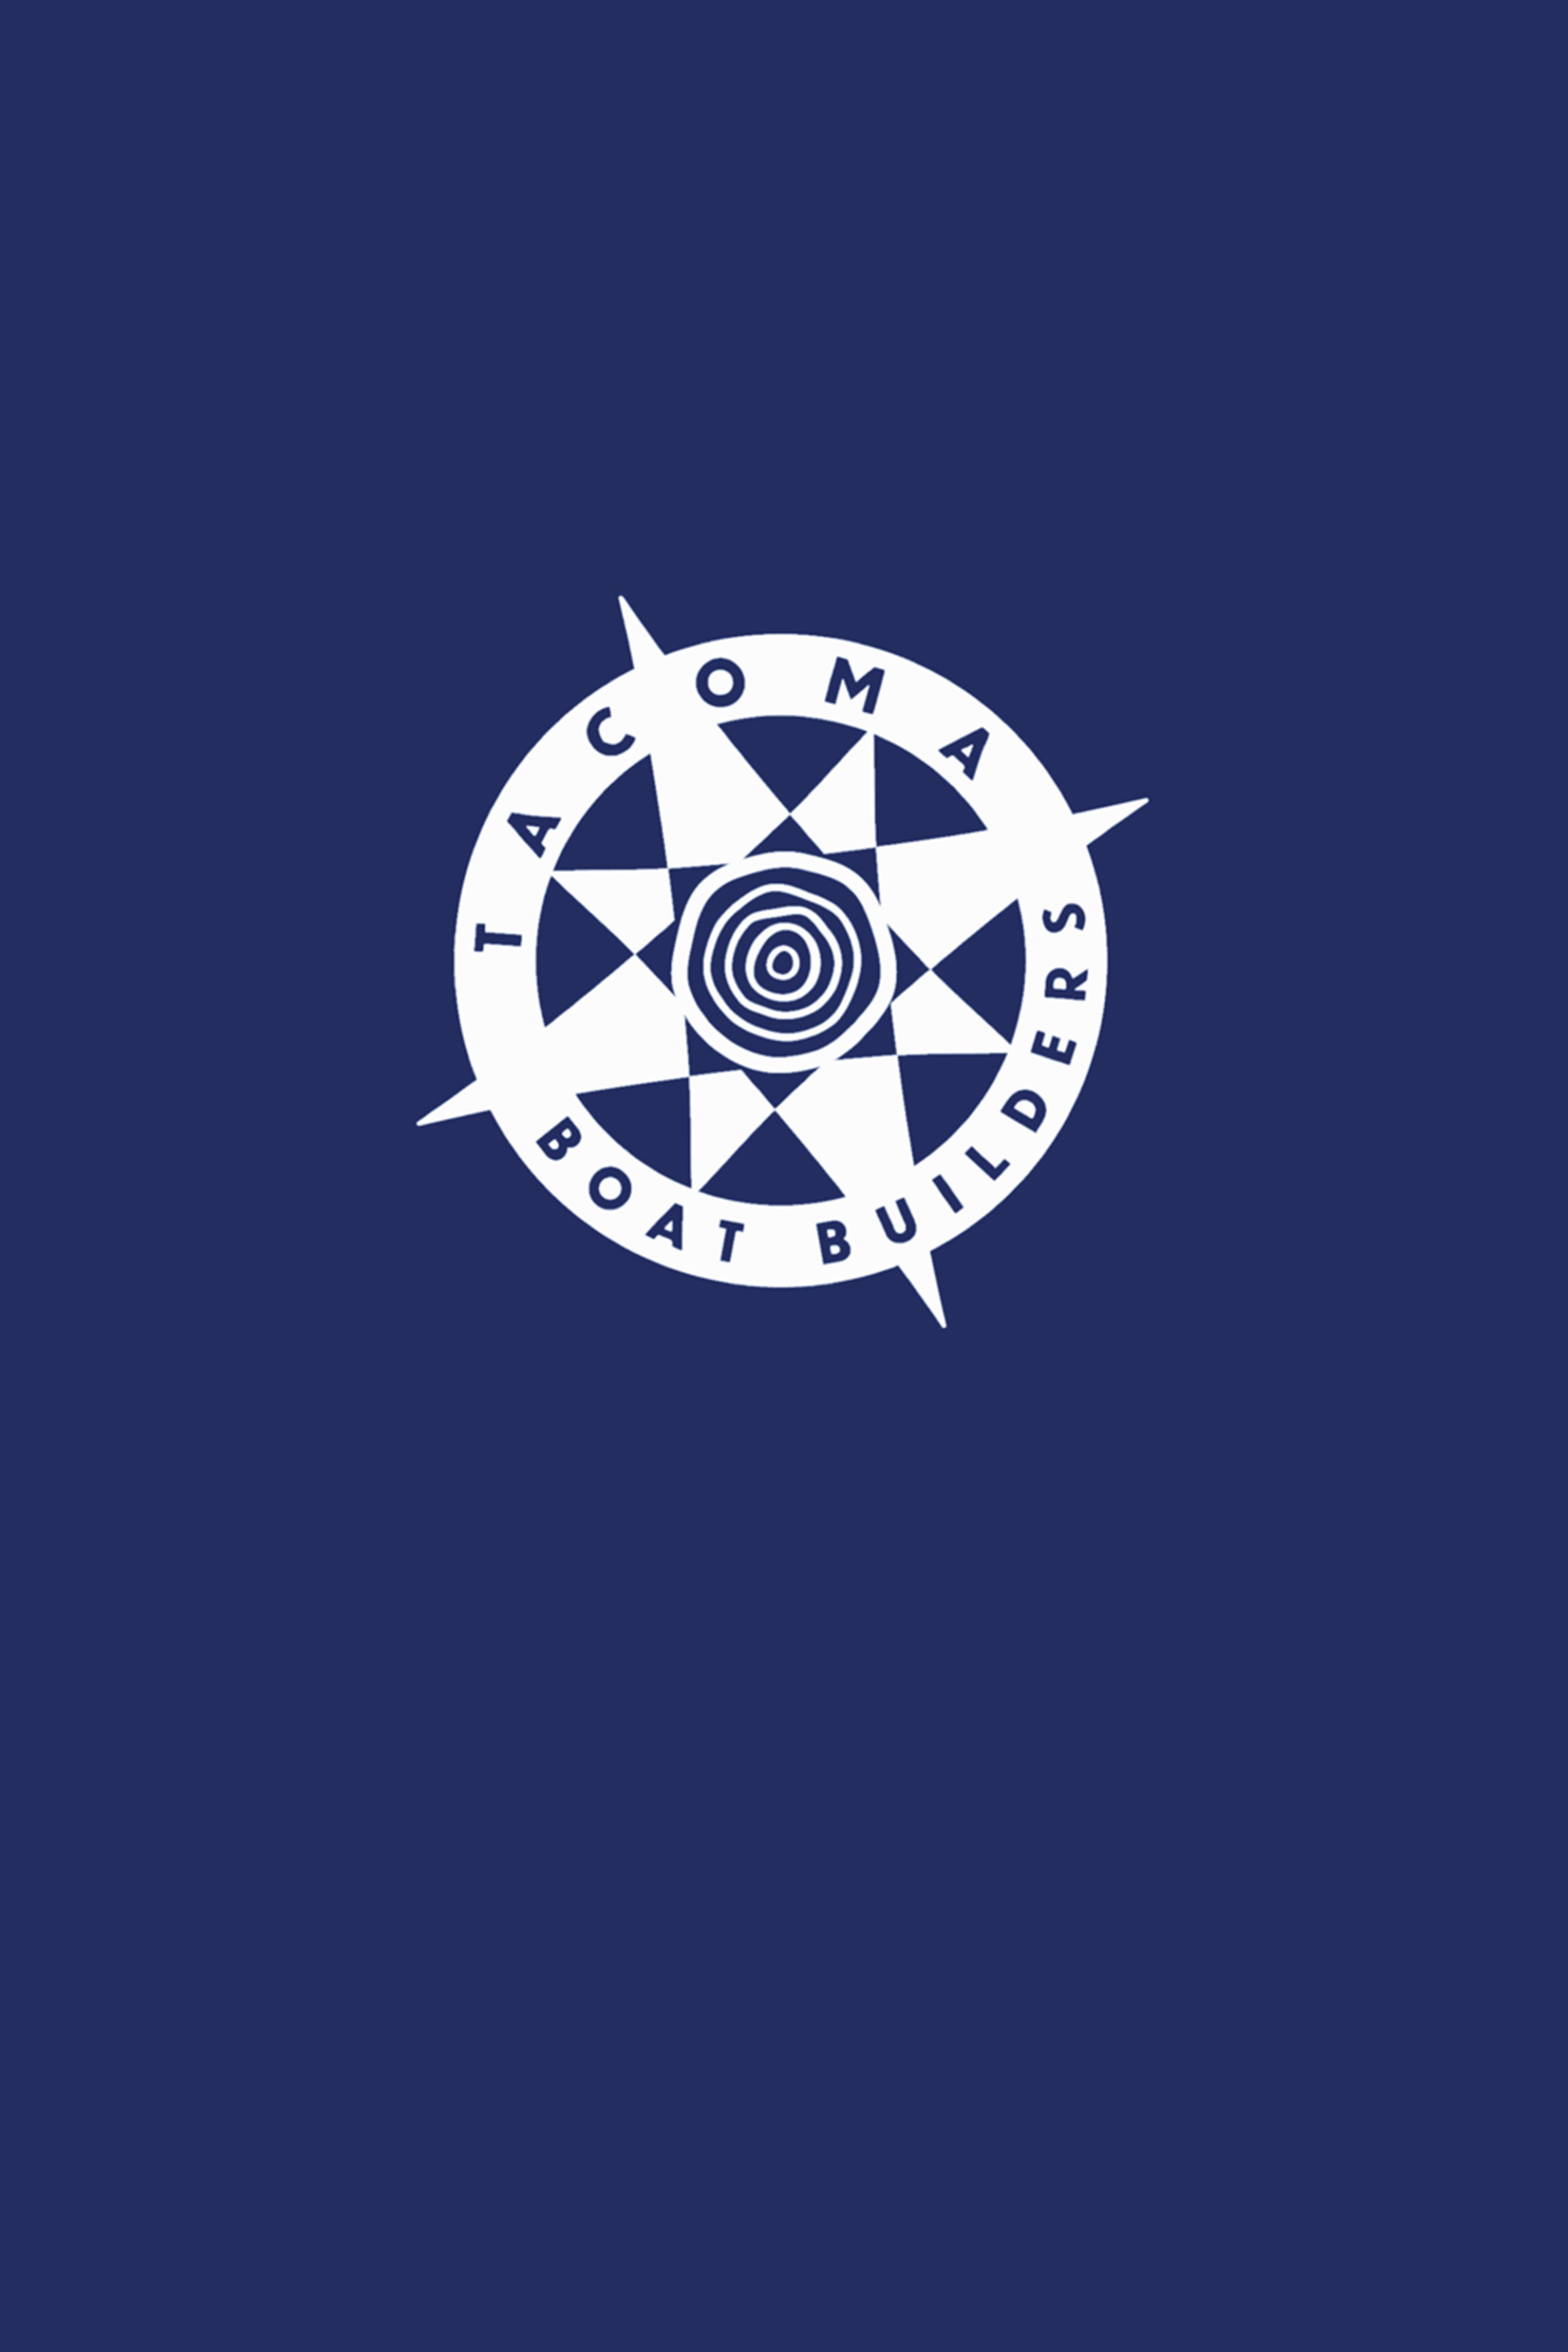 Tacoma Boat Builders logo